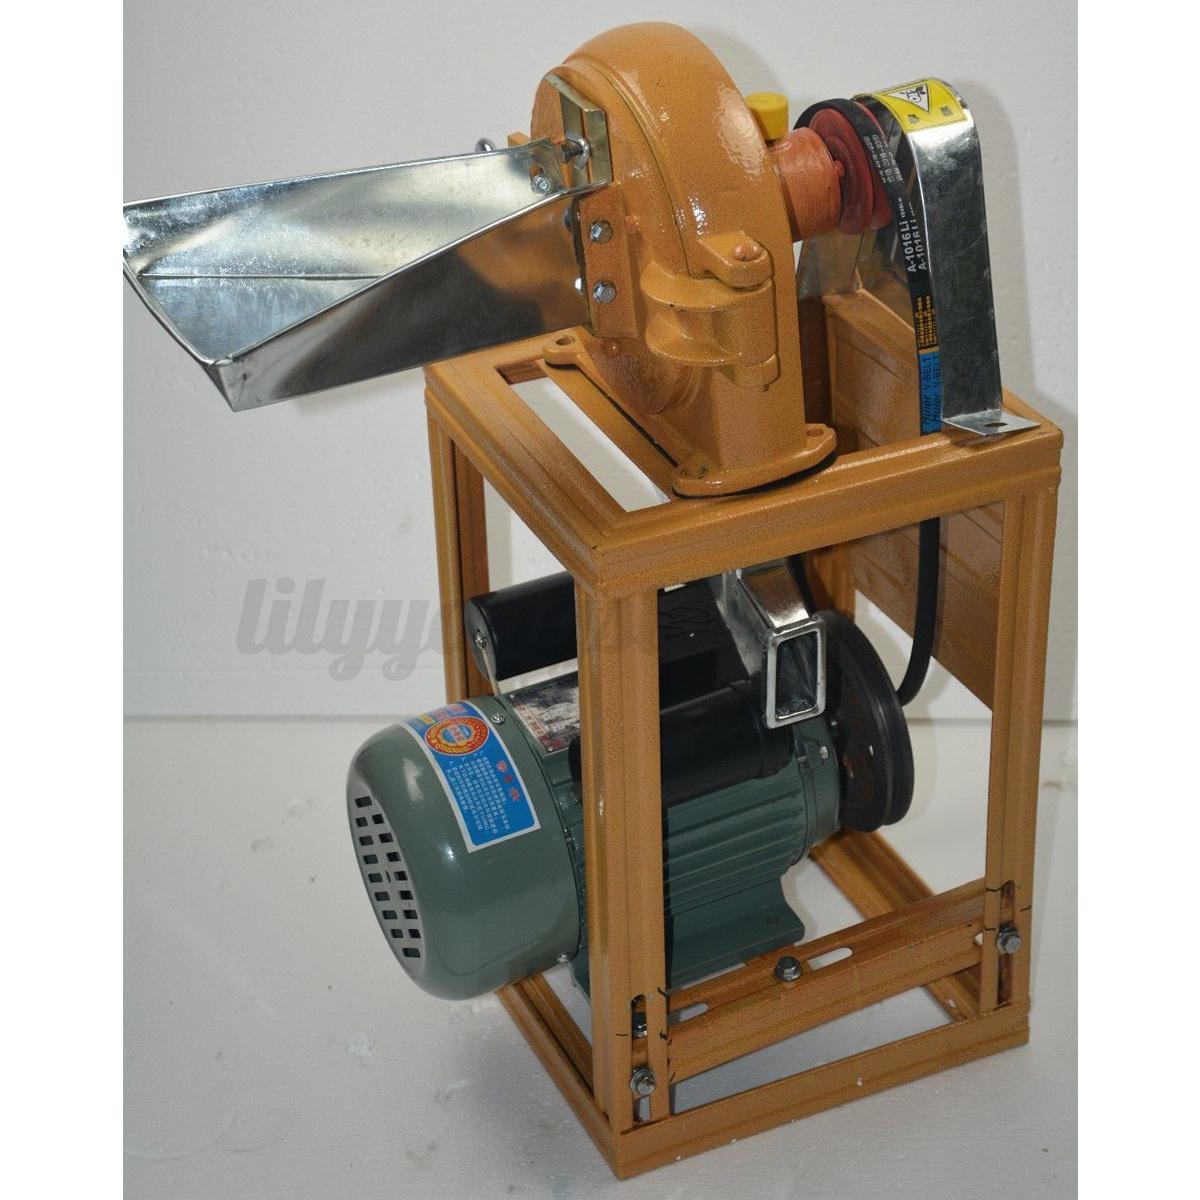 grain grinding machine commercial corn powder crusher grinder mill wheat flour ebay. Black Bedroom Furniture Sets. Home Design Ideas